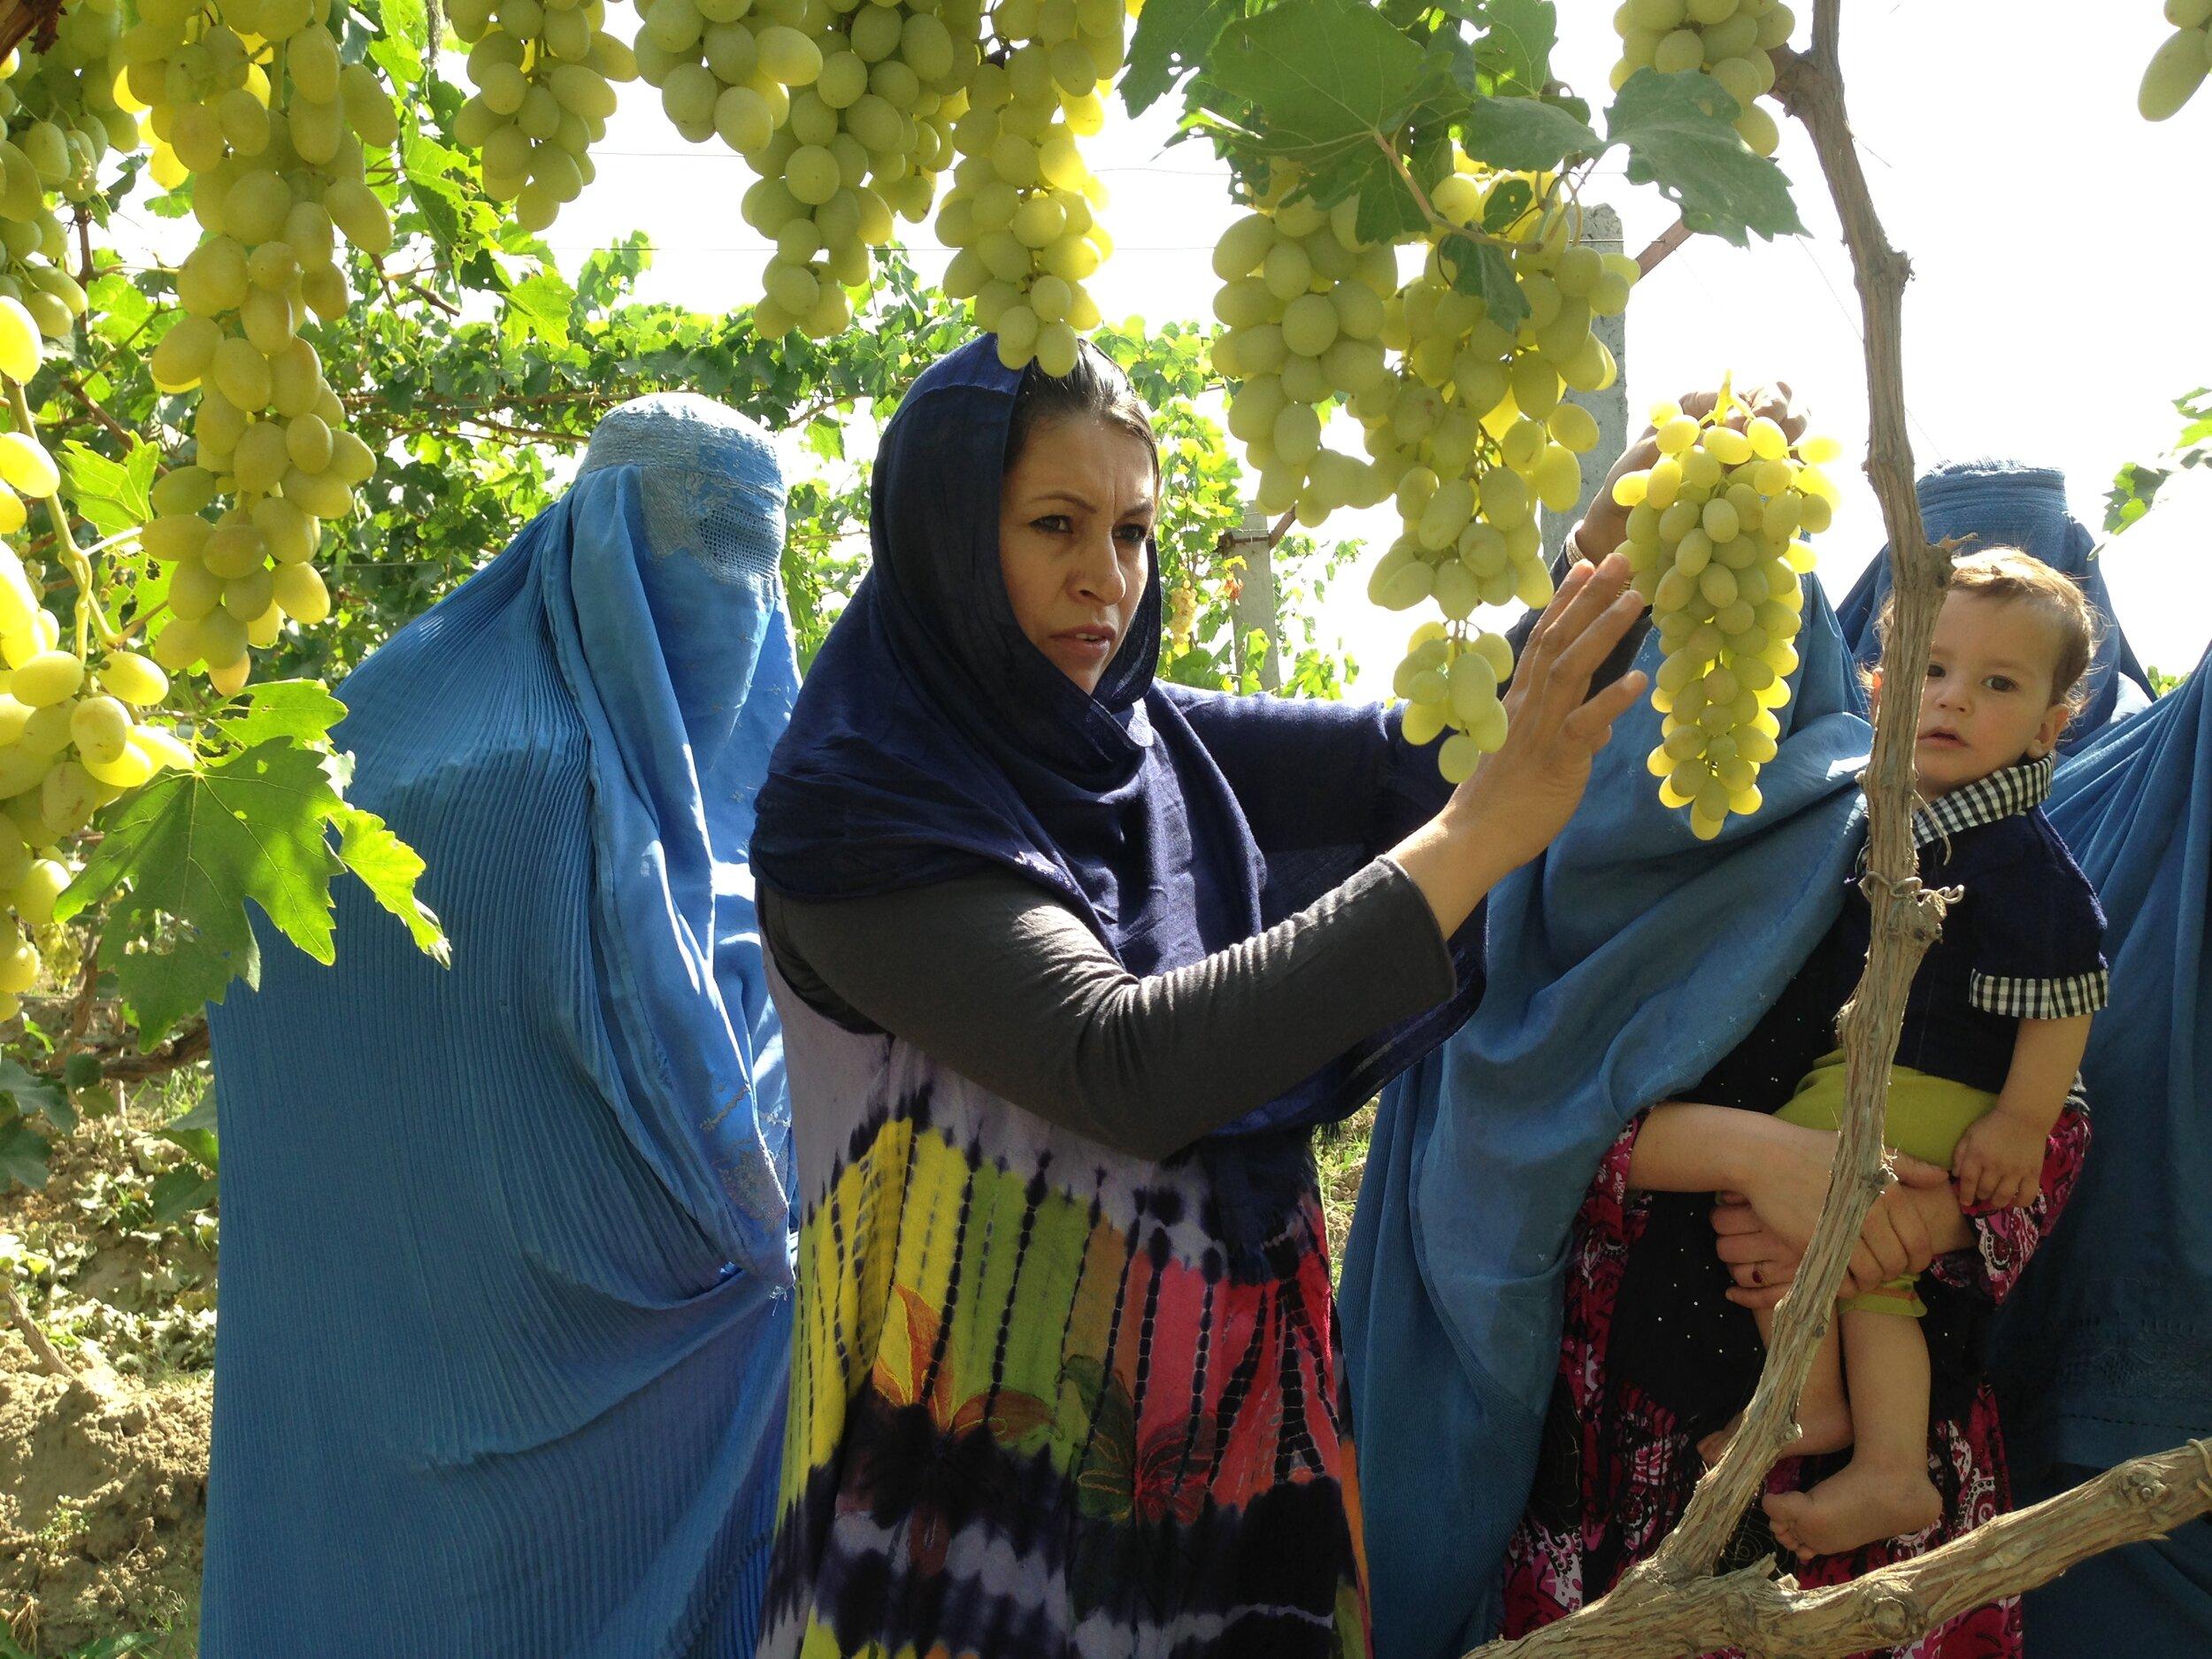 Afghan-Women-Farmers-Vineyard-grapes-Roots-of-Peace-ROP-burkha.jpg